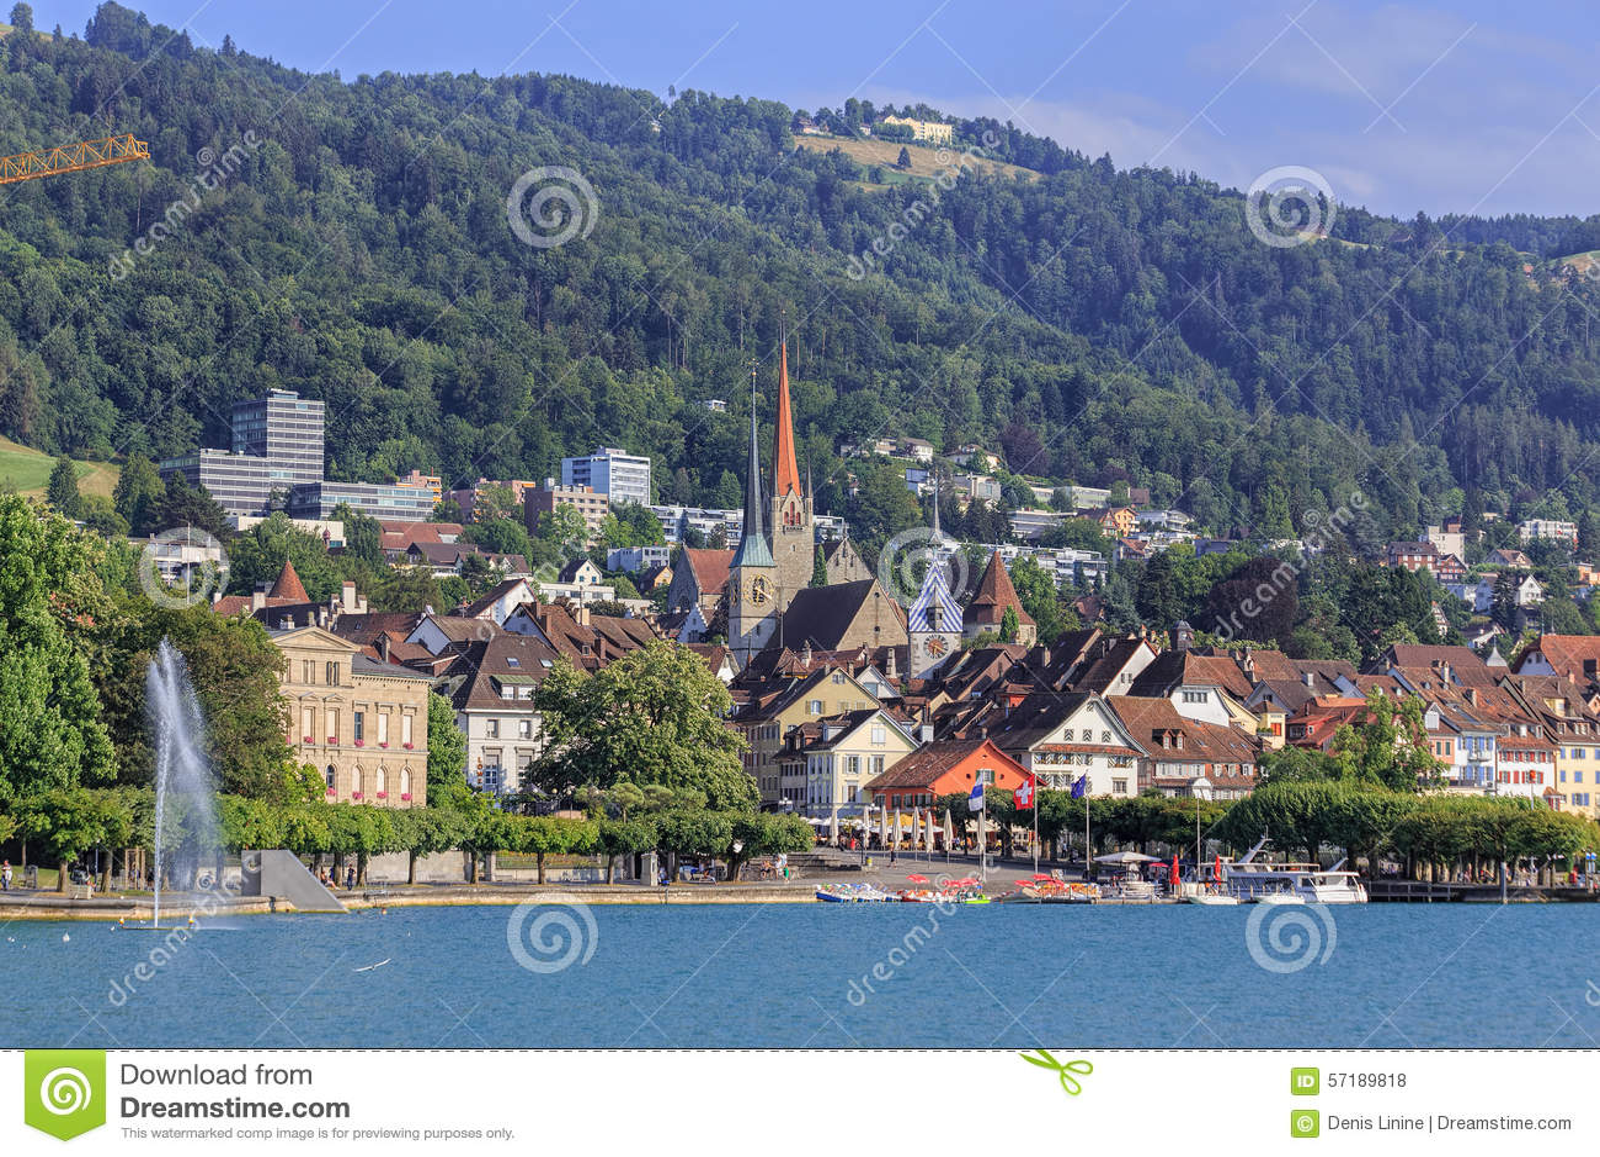 Zug cityscape editorial stock photo. Image of cityscape - 57189818